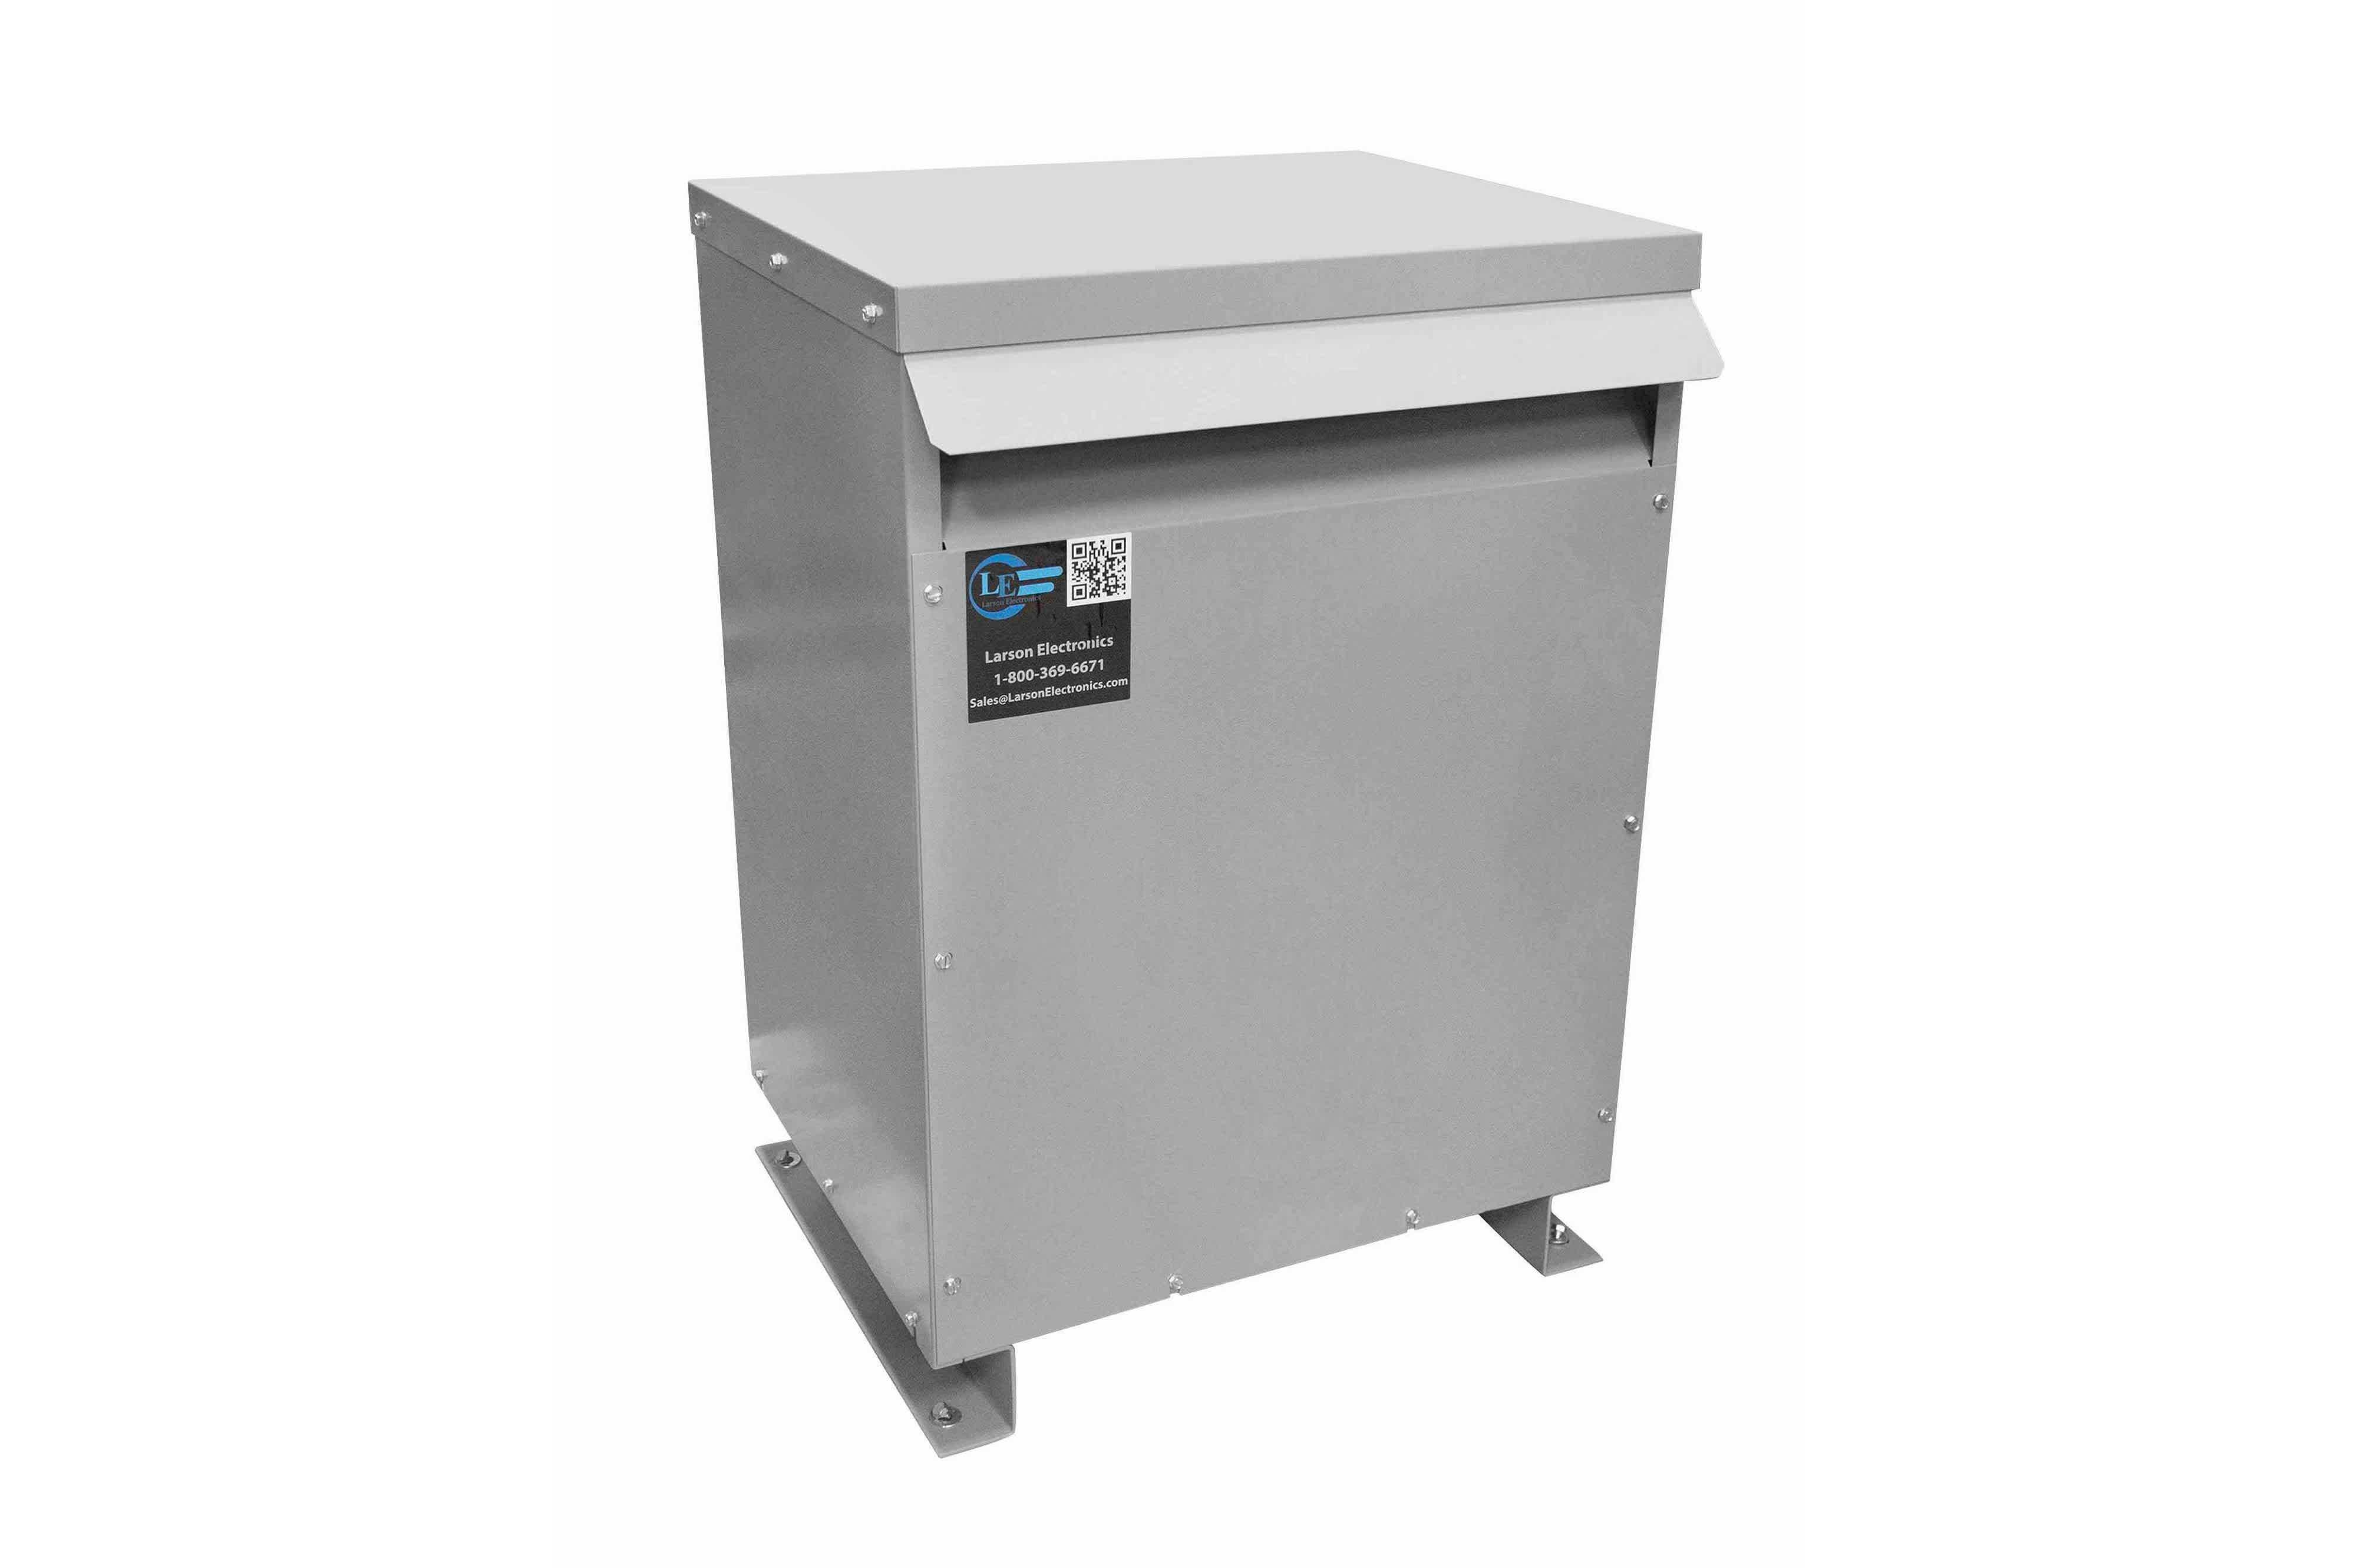 700 kVA 3PH Isolation Transformer, 208V Wye Primary, 600V Delta Secondary, N3R, Ventilated, 60 Hz